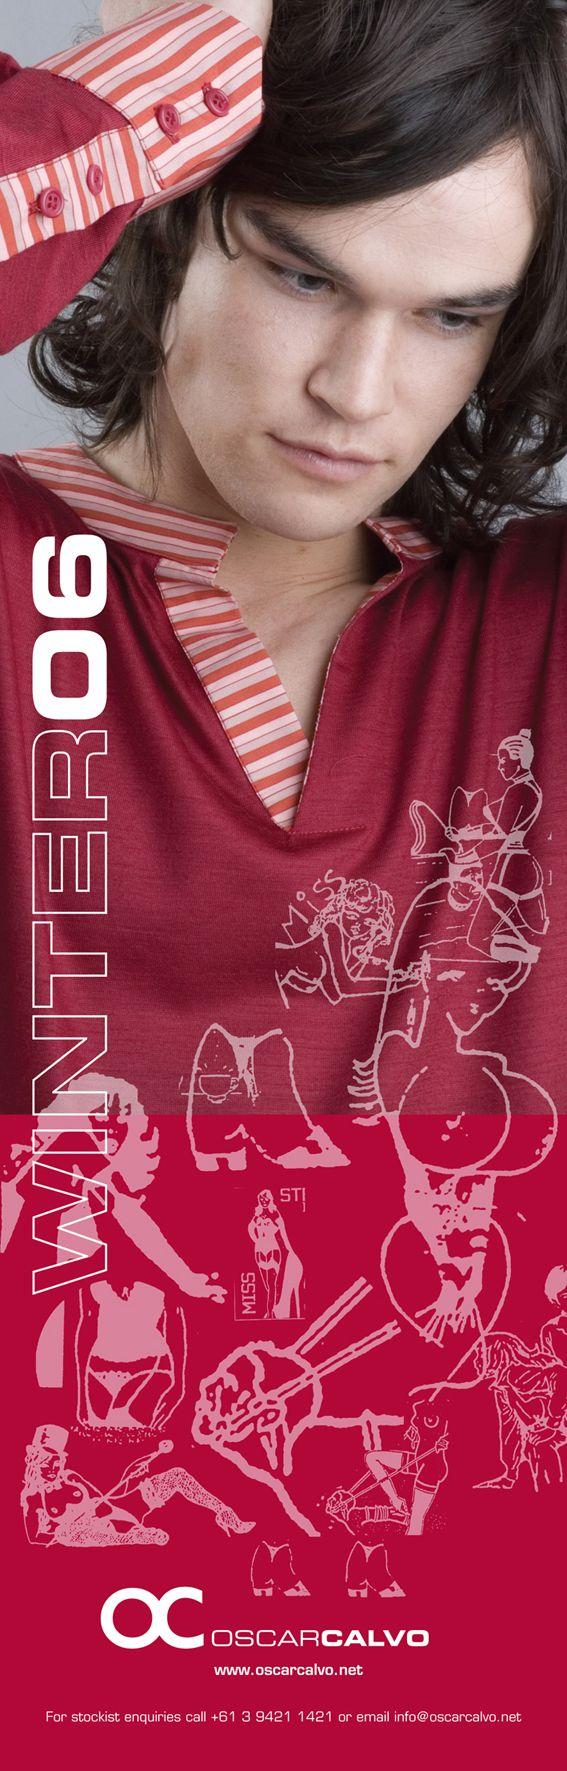 OC OSCARCALVO   WINTER 2006 AD #oscarcalvo #menswear #mensfashion #mensclothing